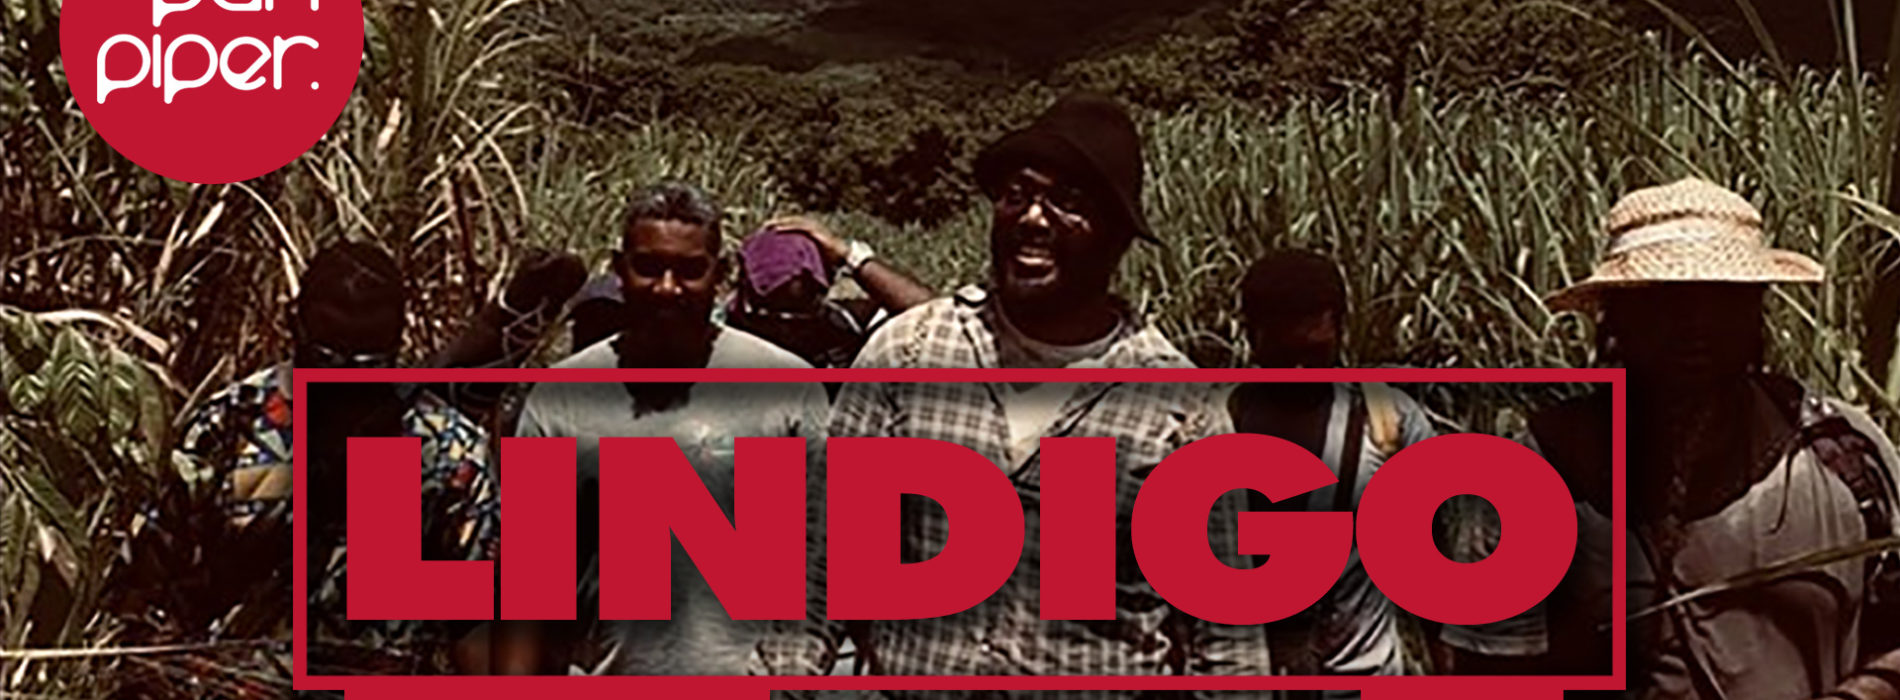 LiNDiGO – Koman Na Fé / Kosa Néna (audio) – Février 2020 — LINDIGO EN CONCERT À PARIS LE 06 MARS 2020